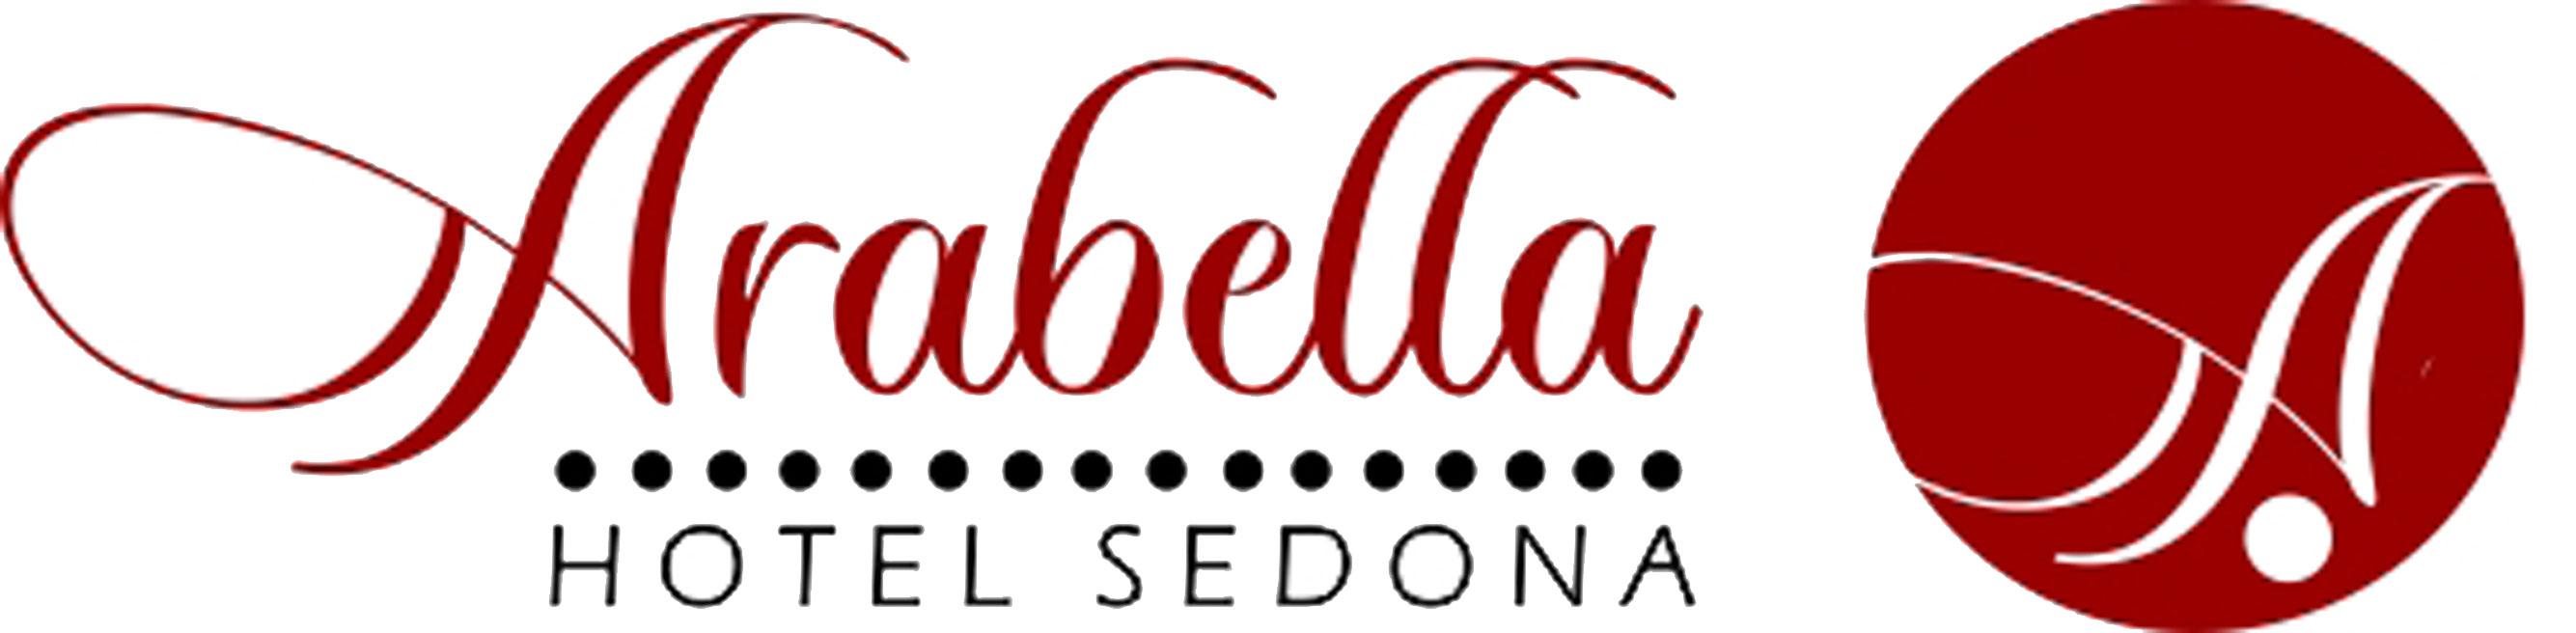 Arabella Logo